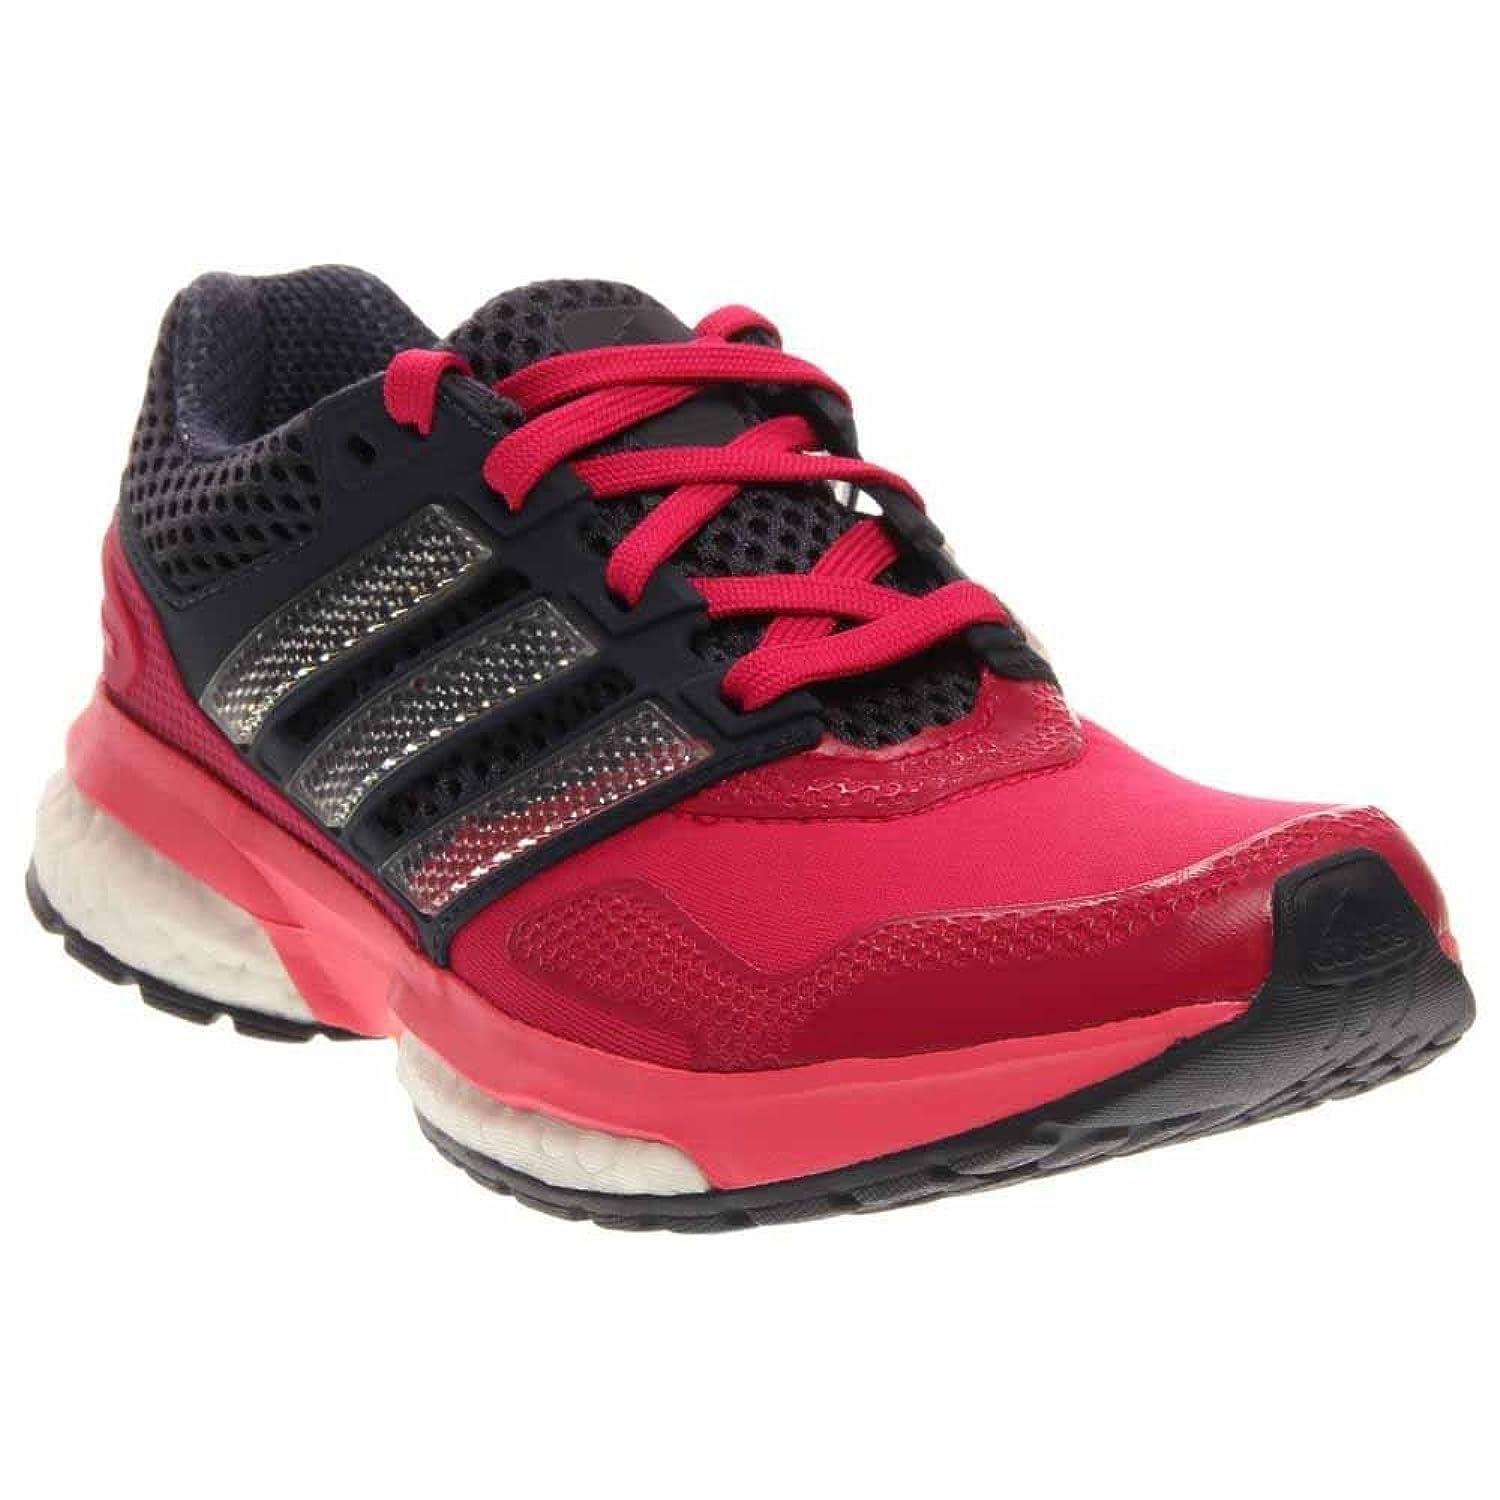 adidas Response Boost Tech Fit J Kids Shoes